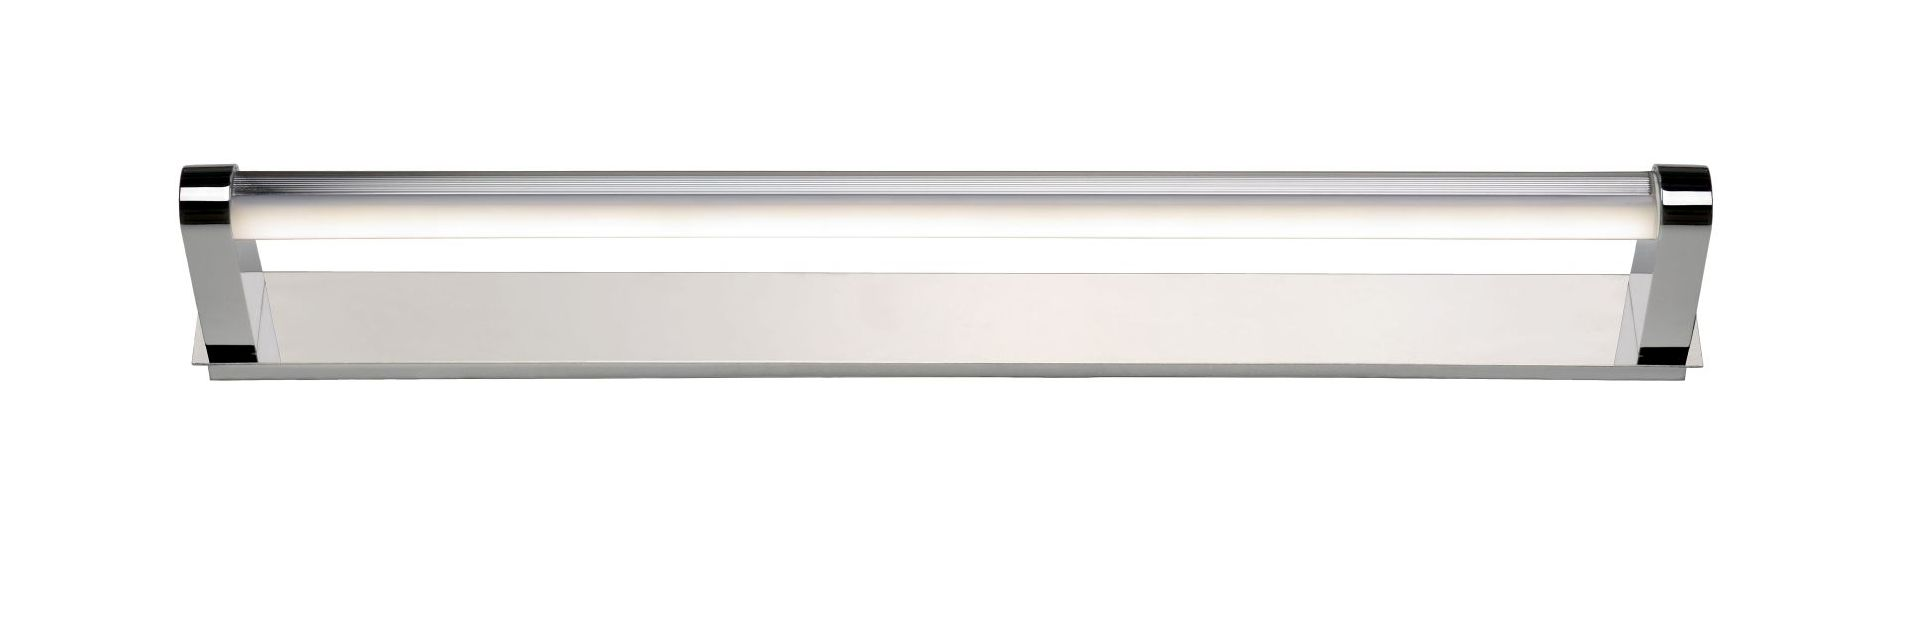 Lampa ścienna ALPA-LED - 39211/10/11